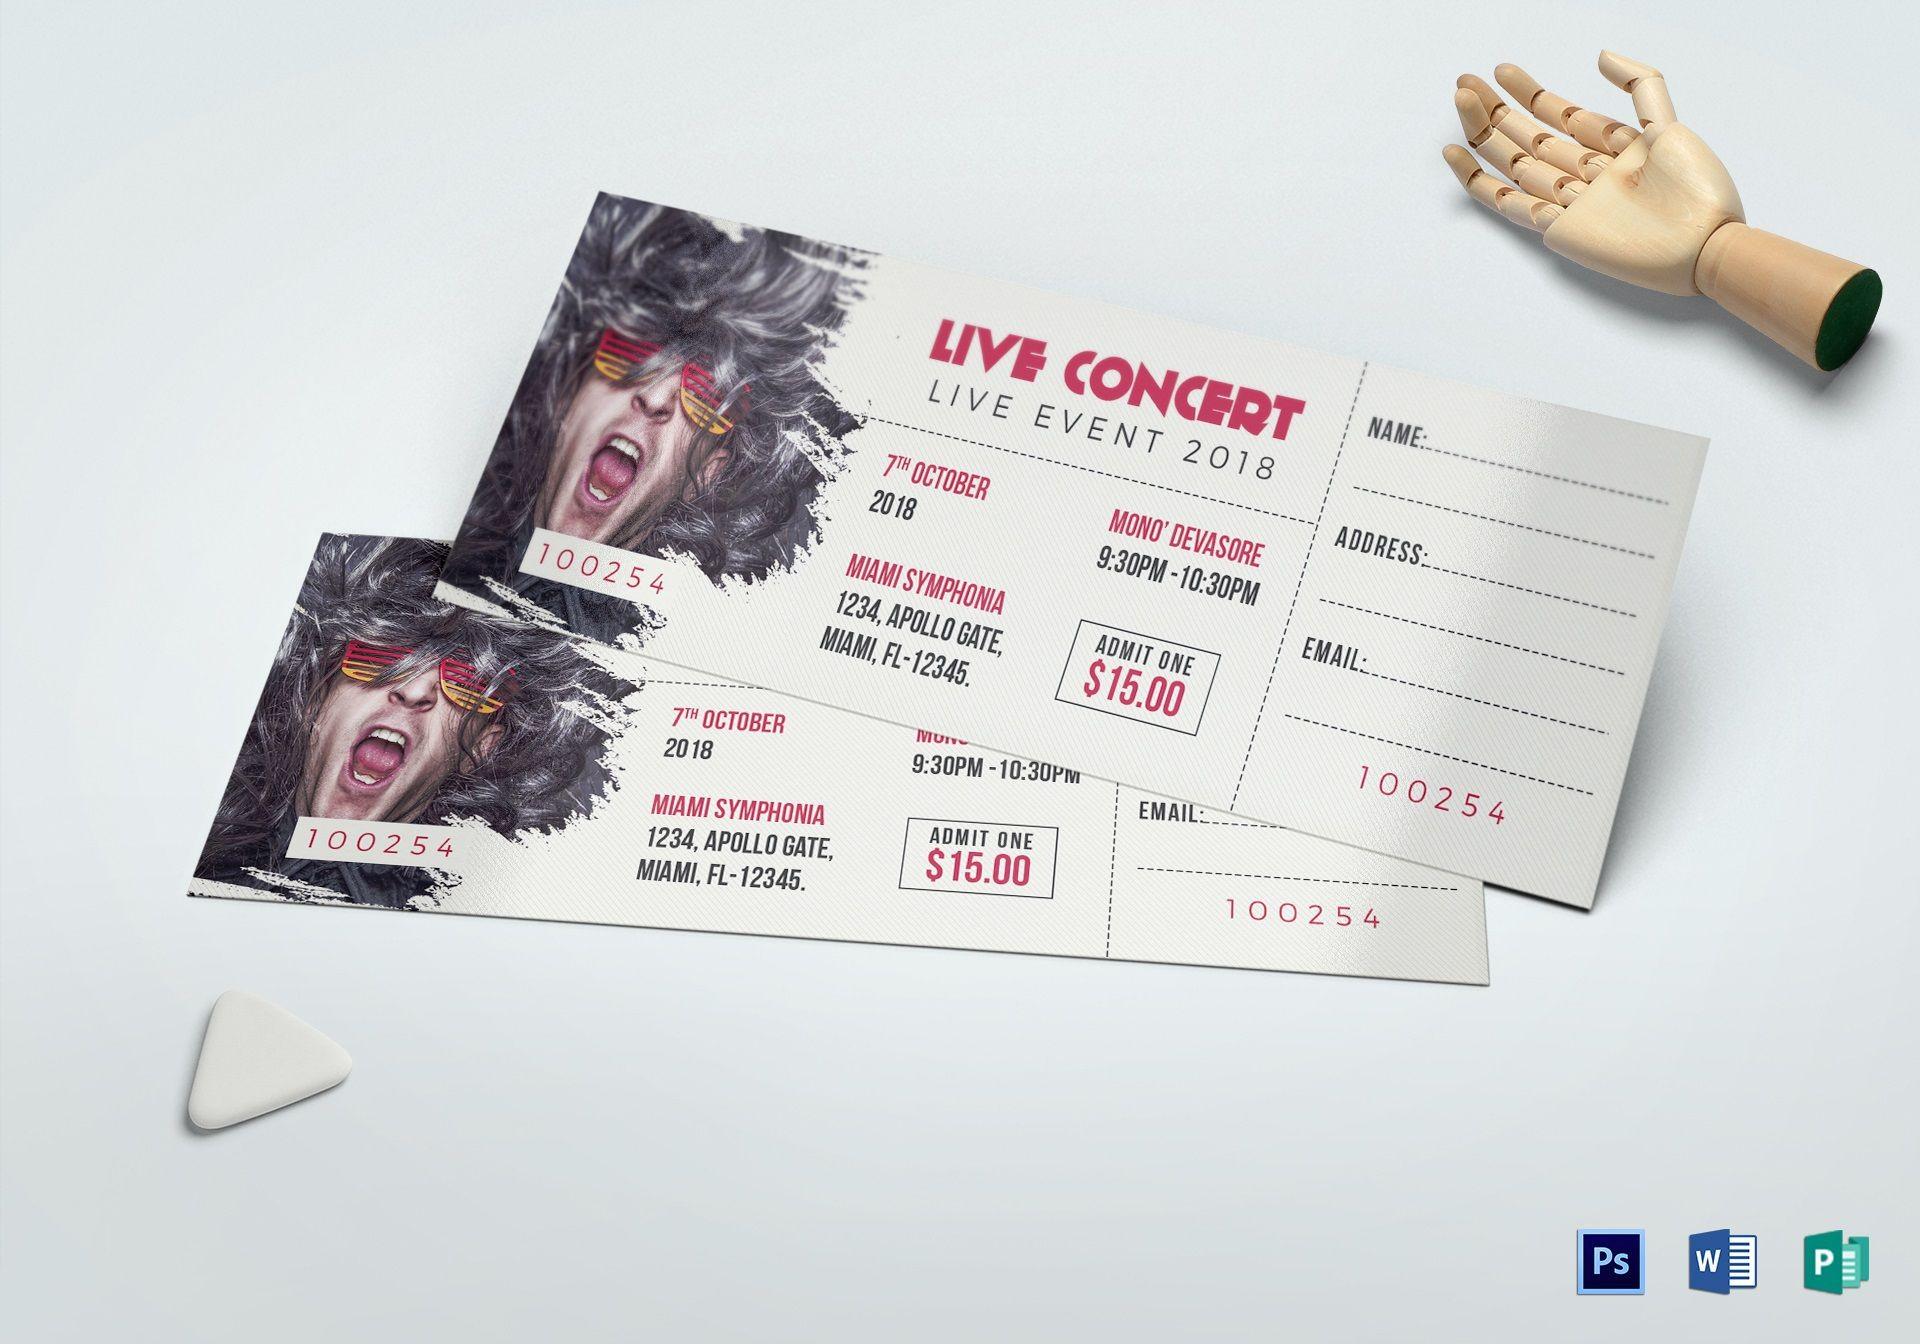 007 Unusual Concert Ticket Template Word Idea  Free Microsoft1920